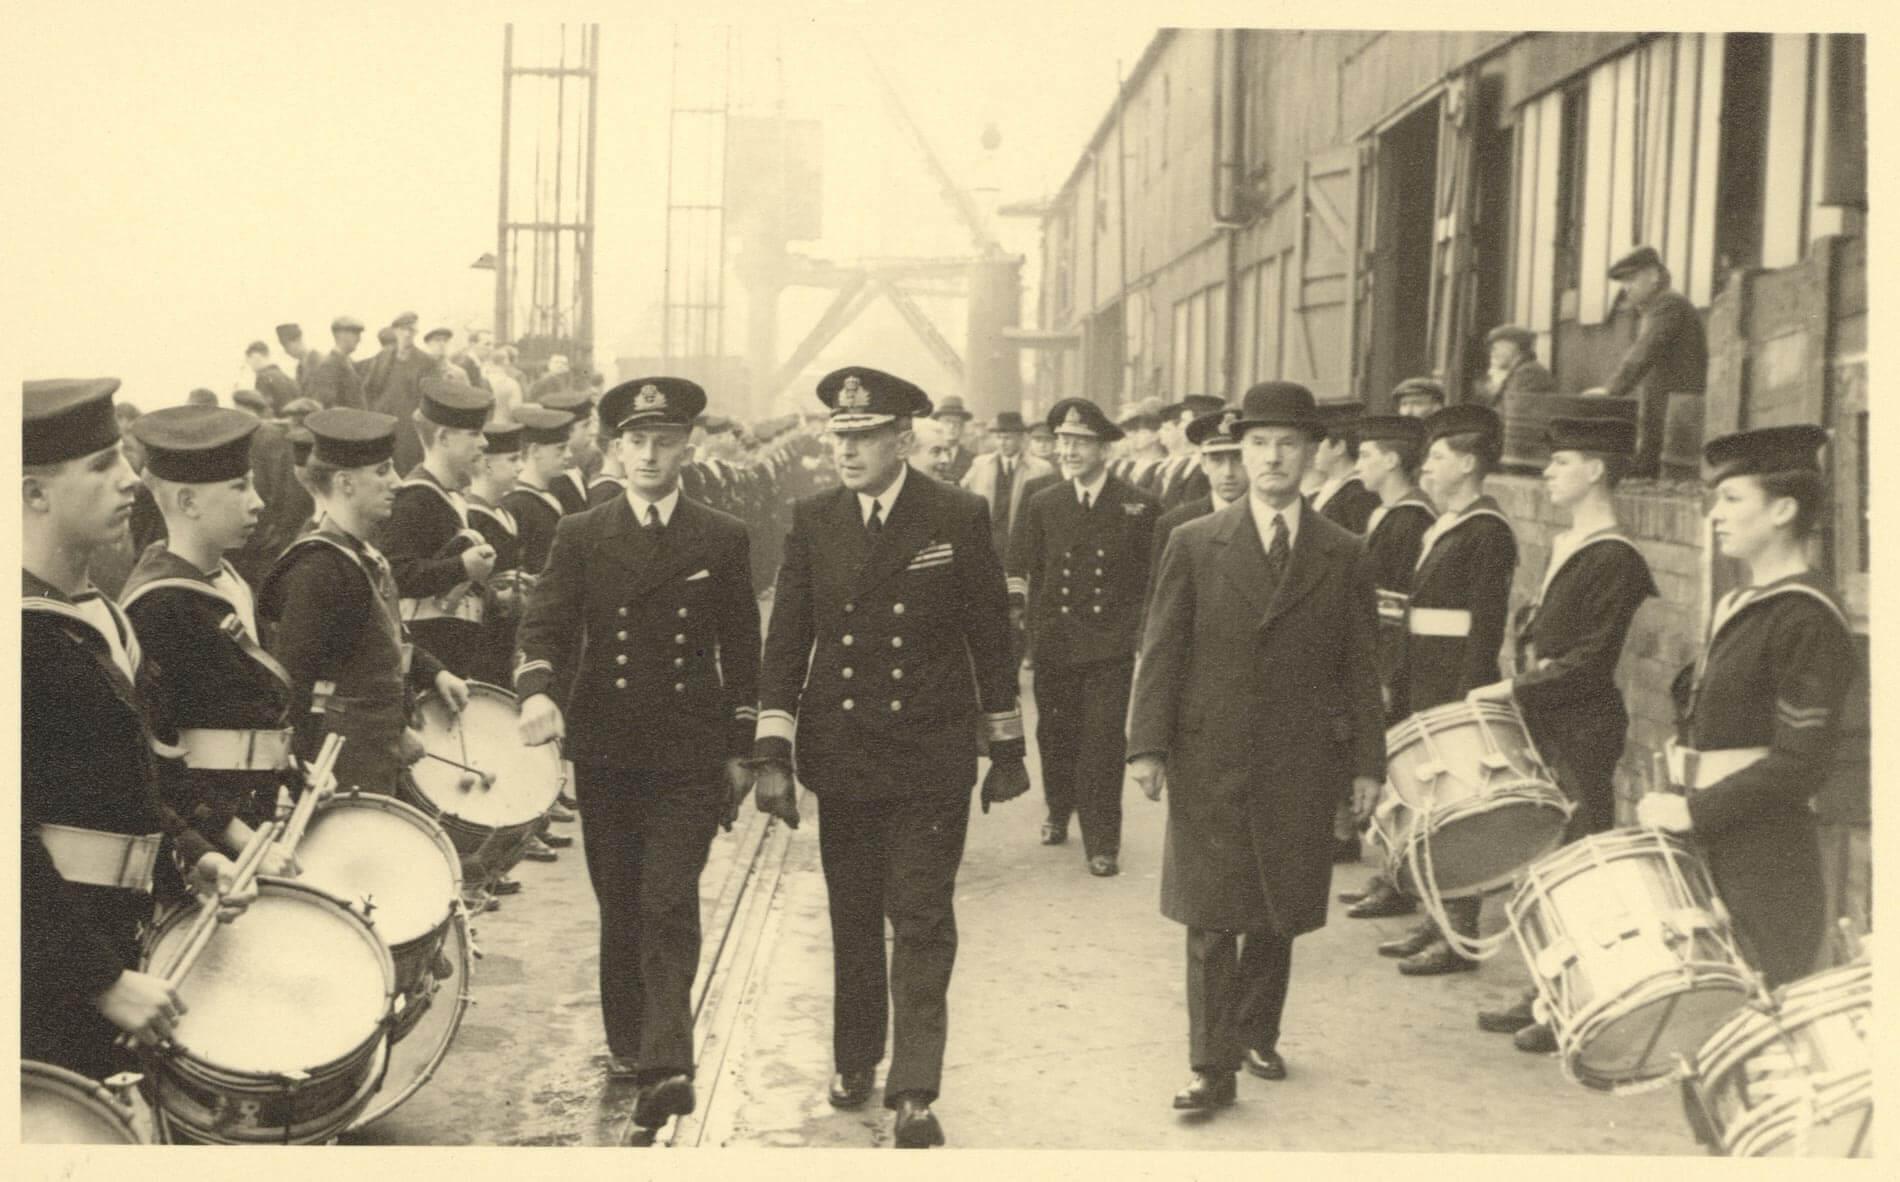 1943-Flag raising Liverpool